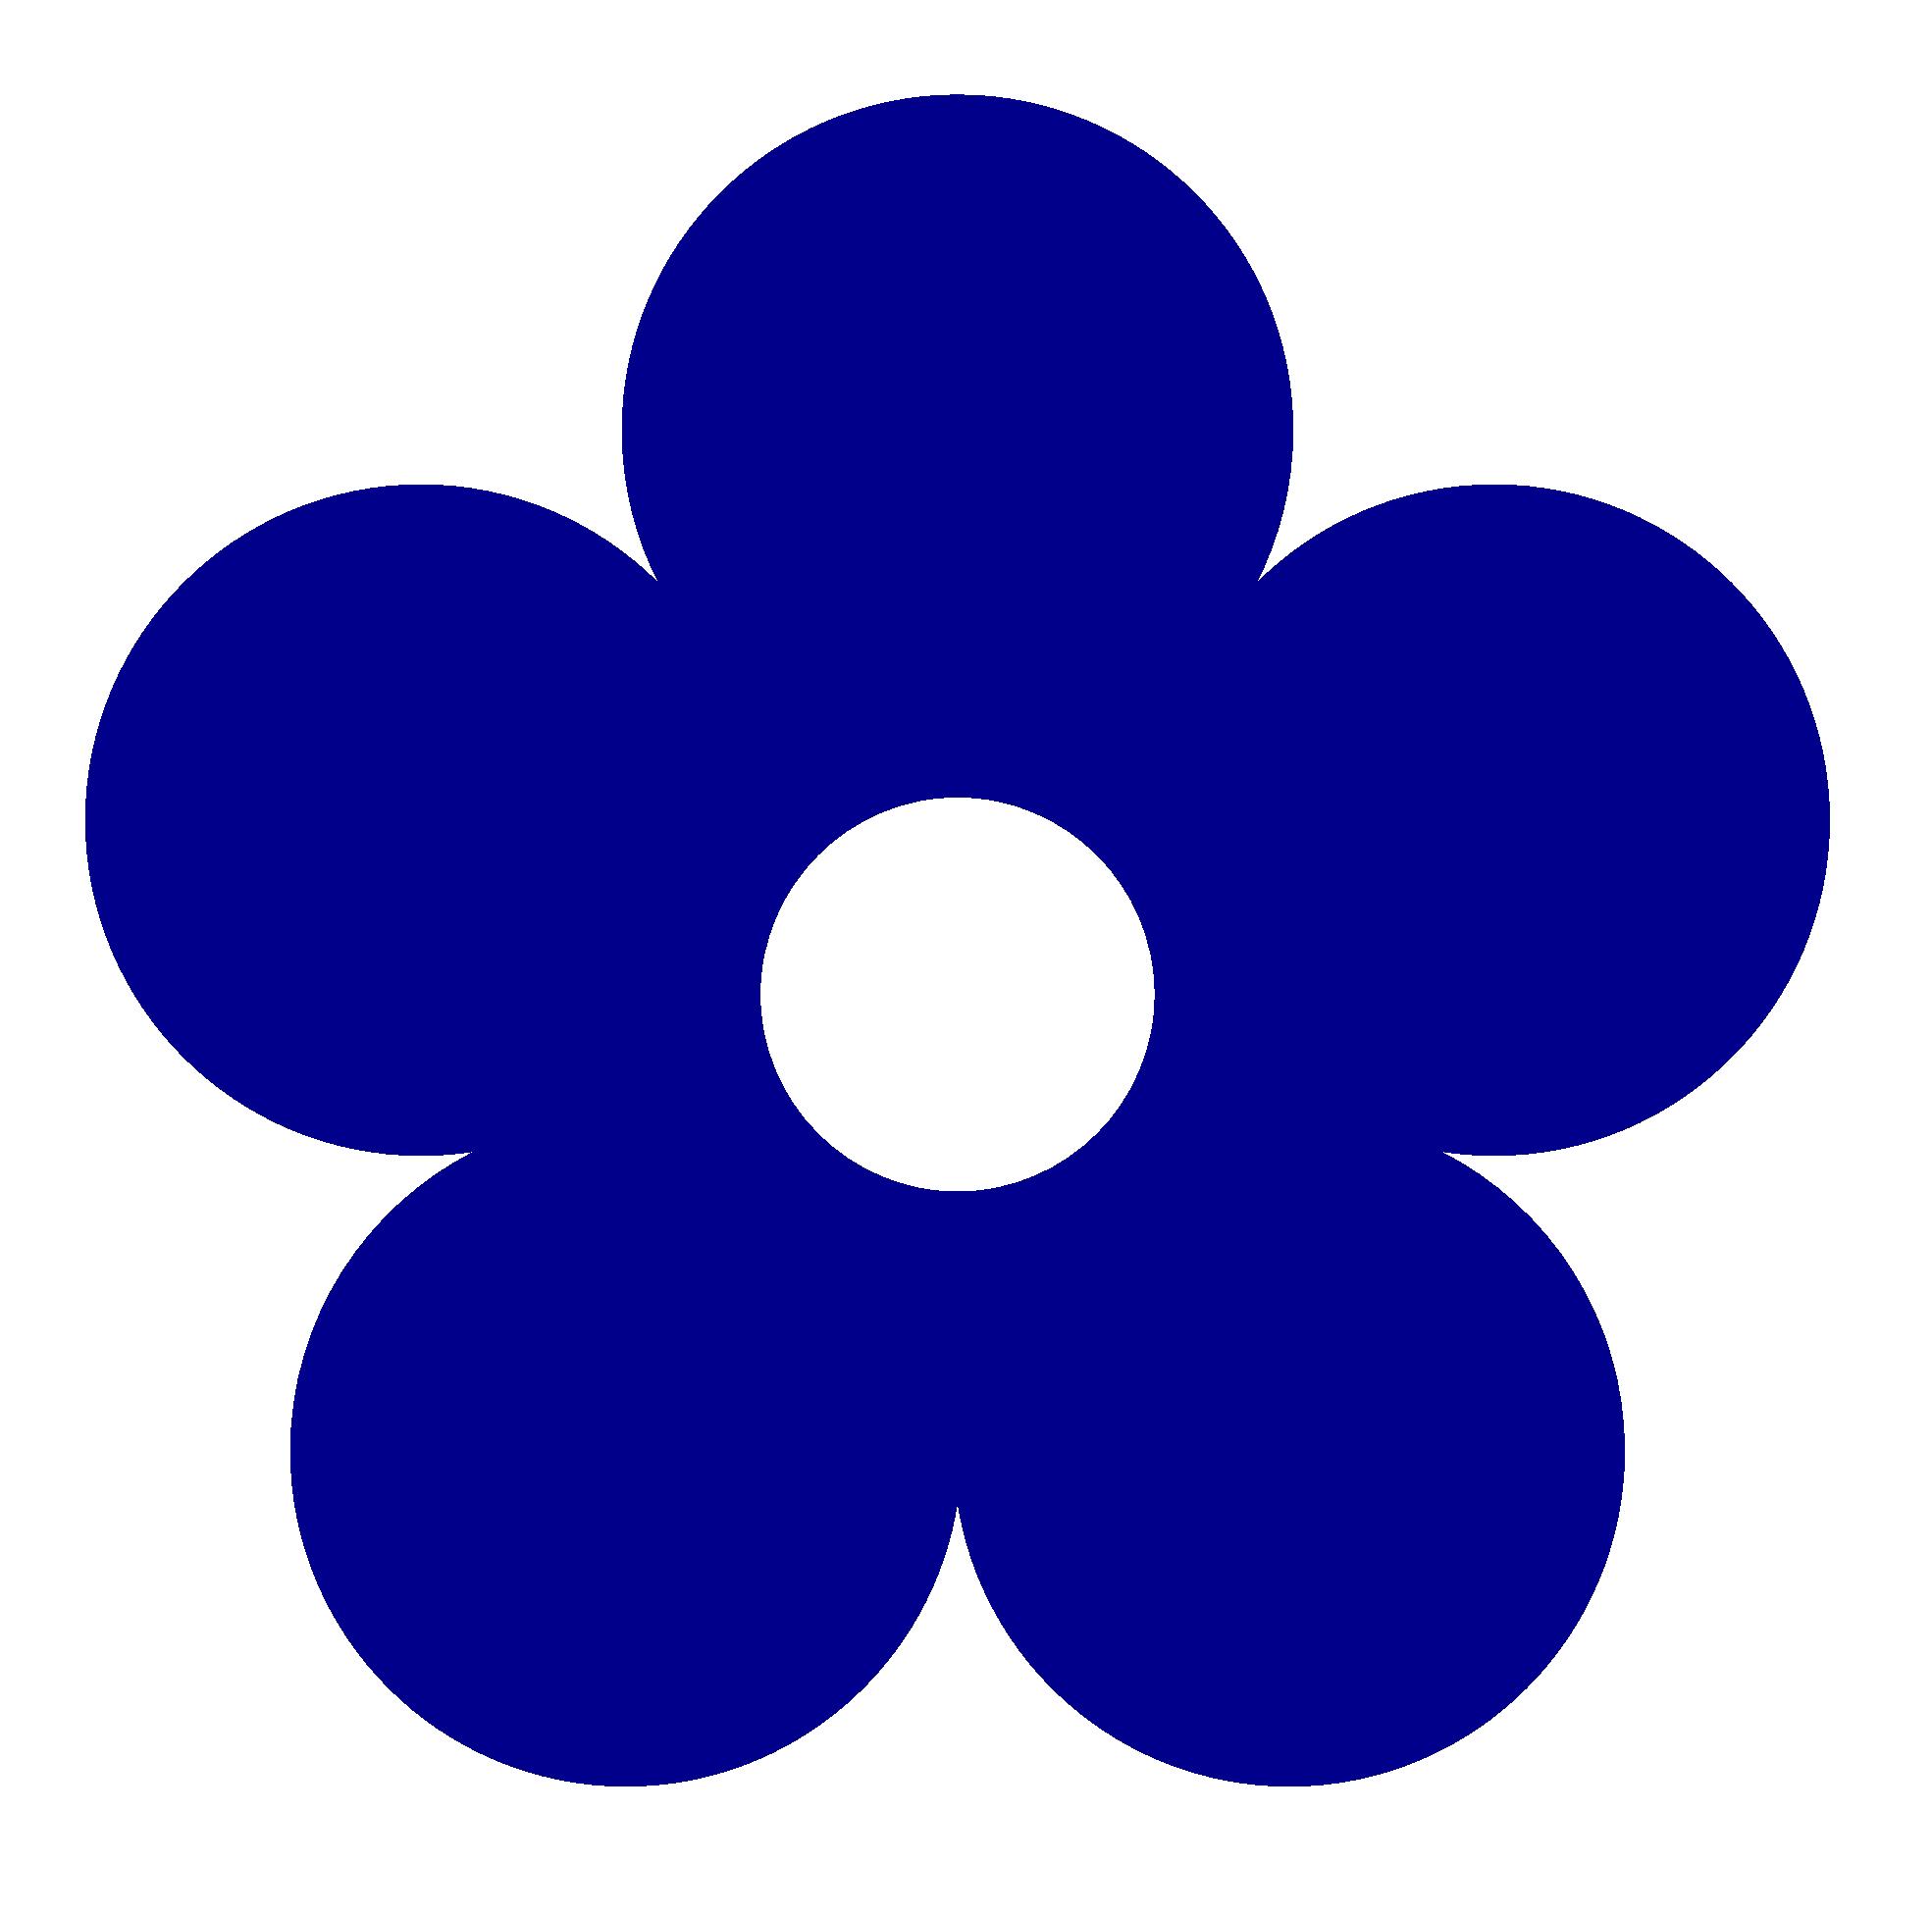 Floral clipart navy blue Clipart Dark  Flower Blue